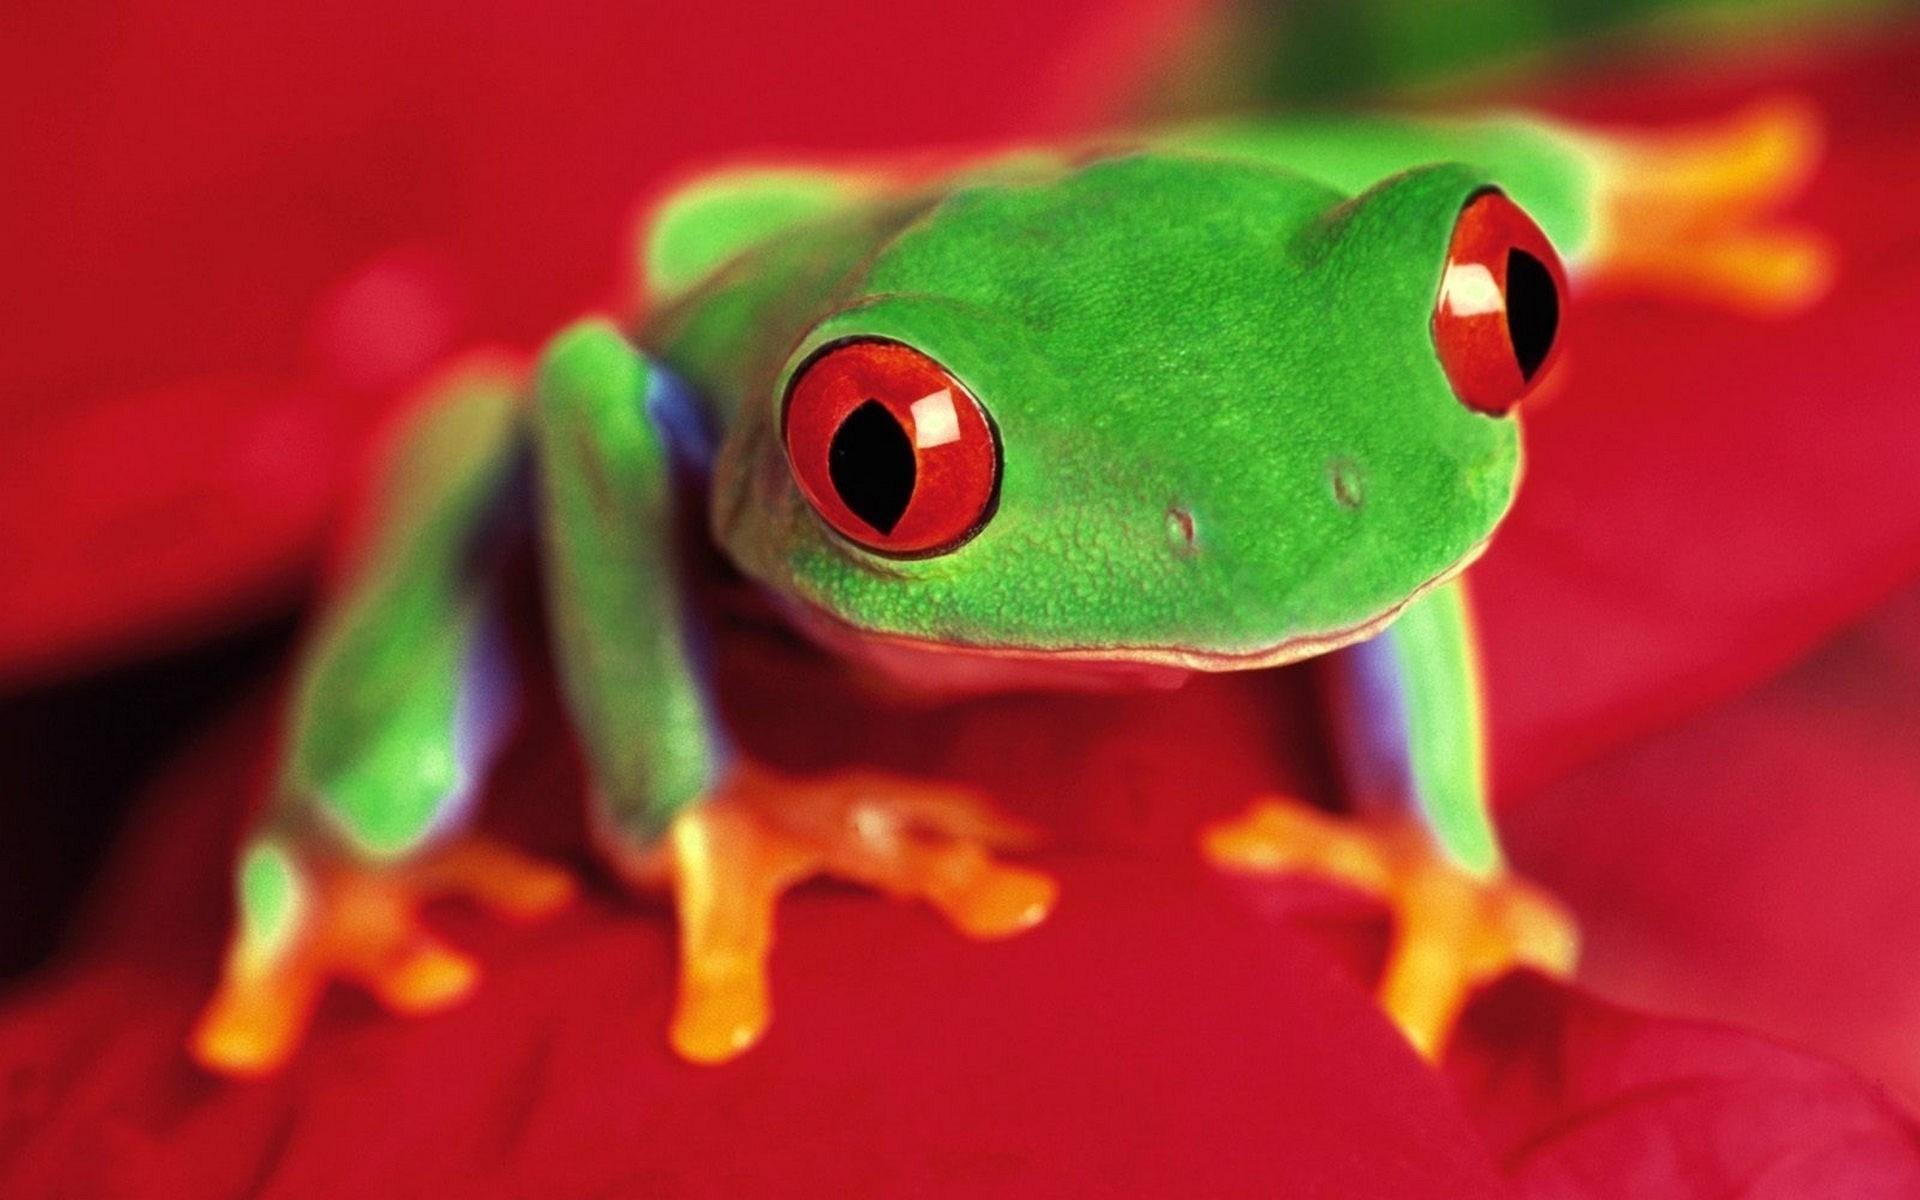 frog funny eyes